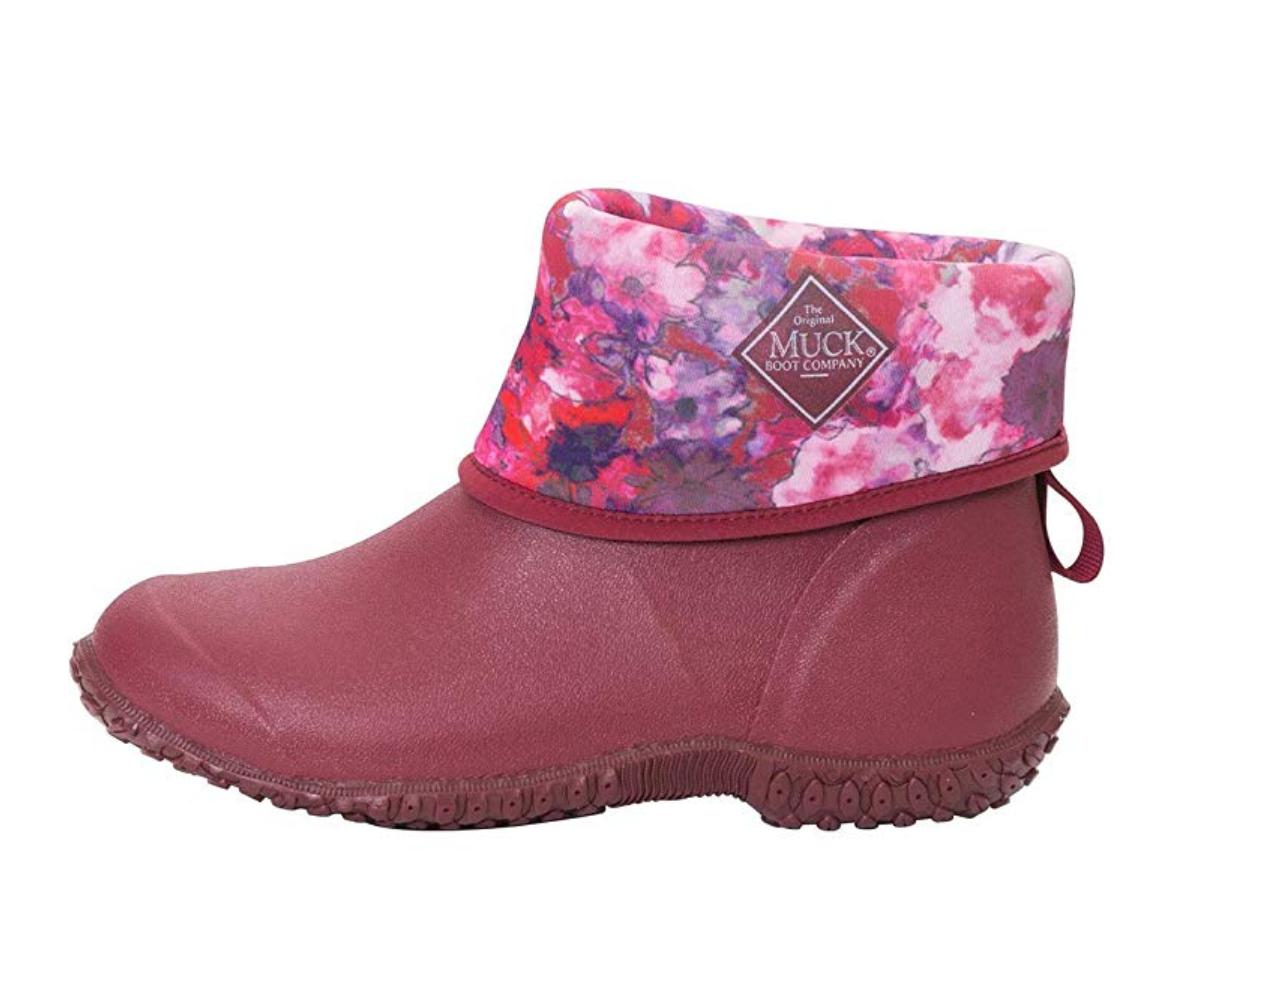 Muck MUCKSTER MID Boot WaterPROOF Garden skor AUTHENTIC AUTHENTIC AUTHENTIC röd Floral kvinnor 11 USA  topp varumärke